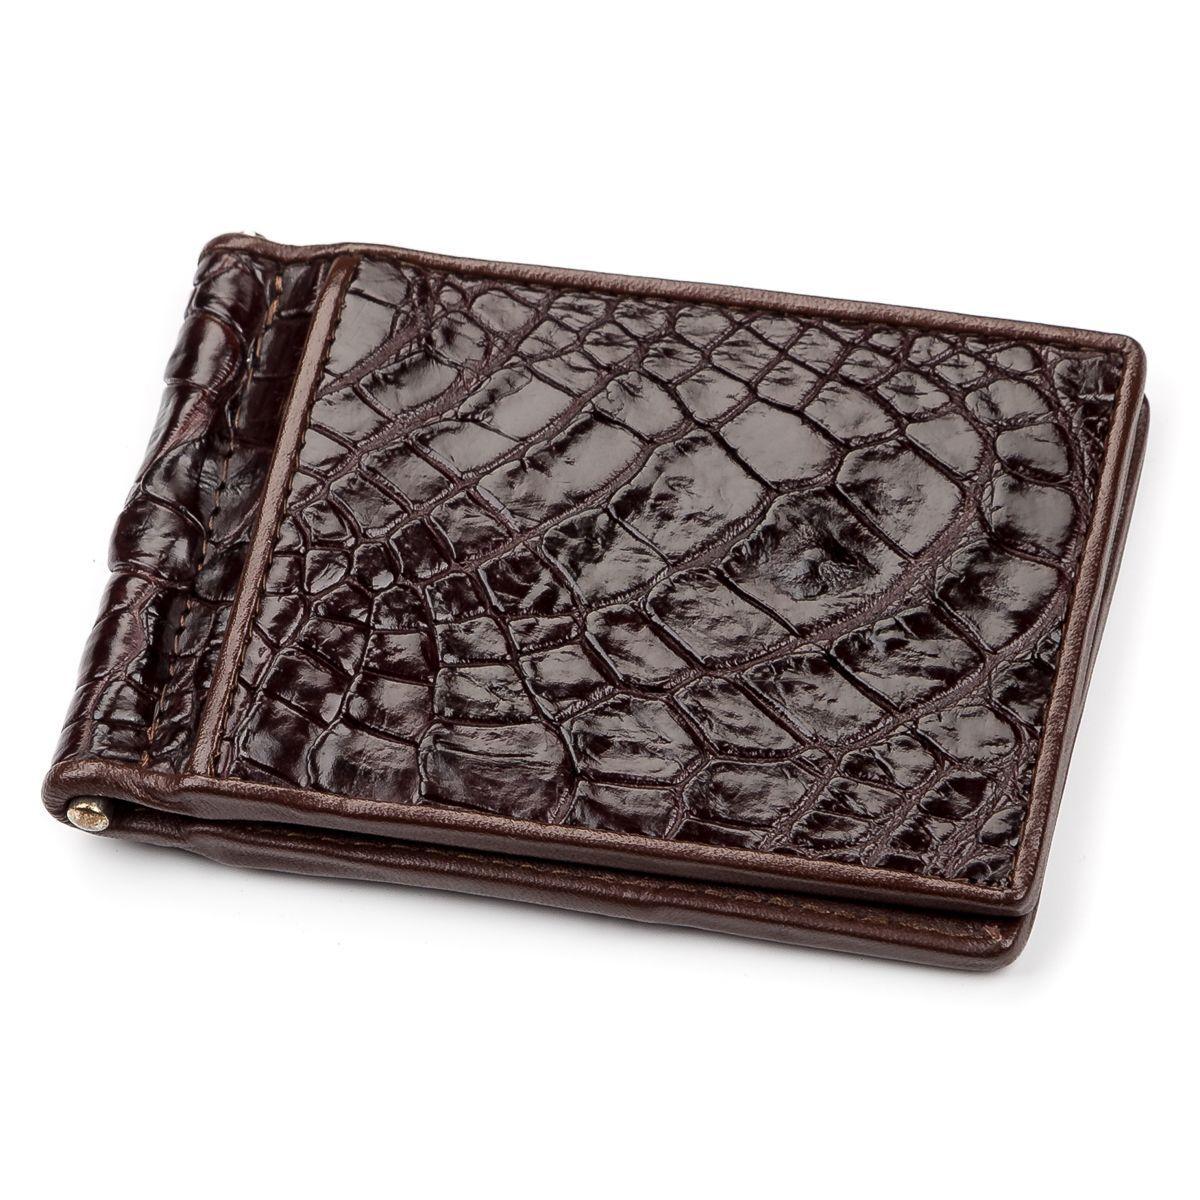 Зажим CROCODILE LEATHER 18052 из натуральной кожи крокодила Коричневый, Коричневый